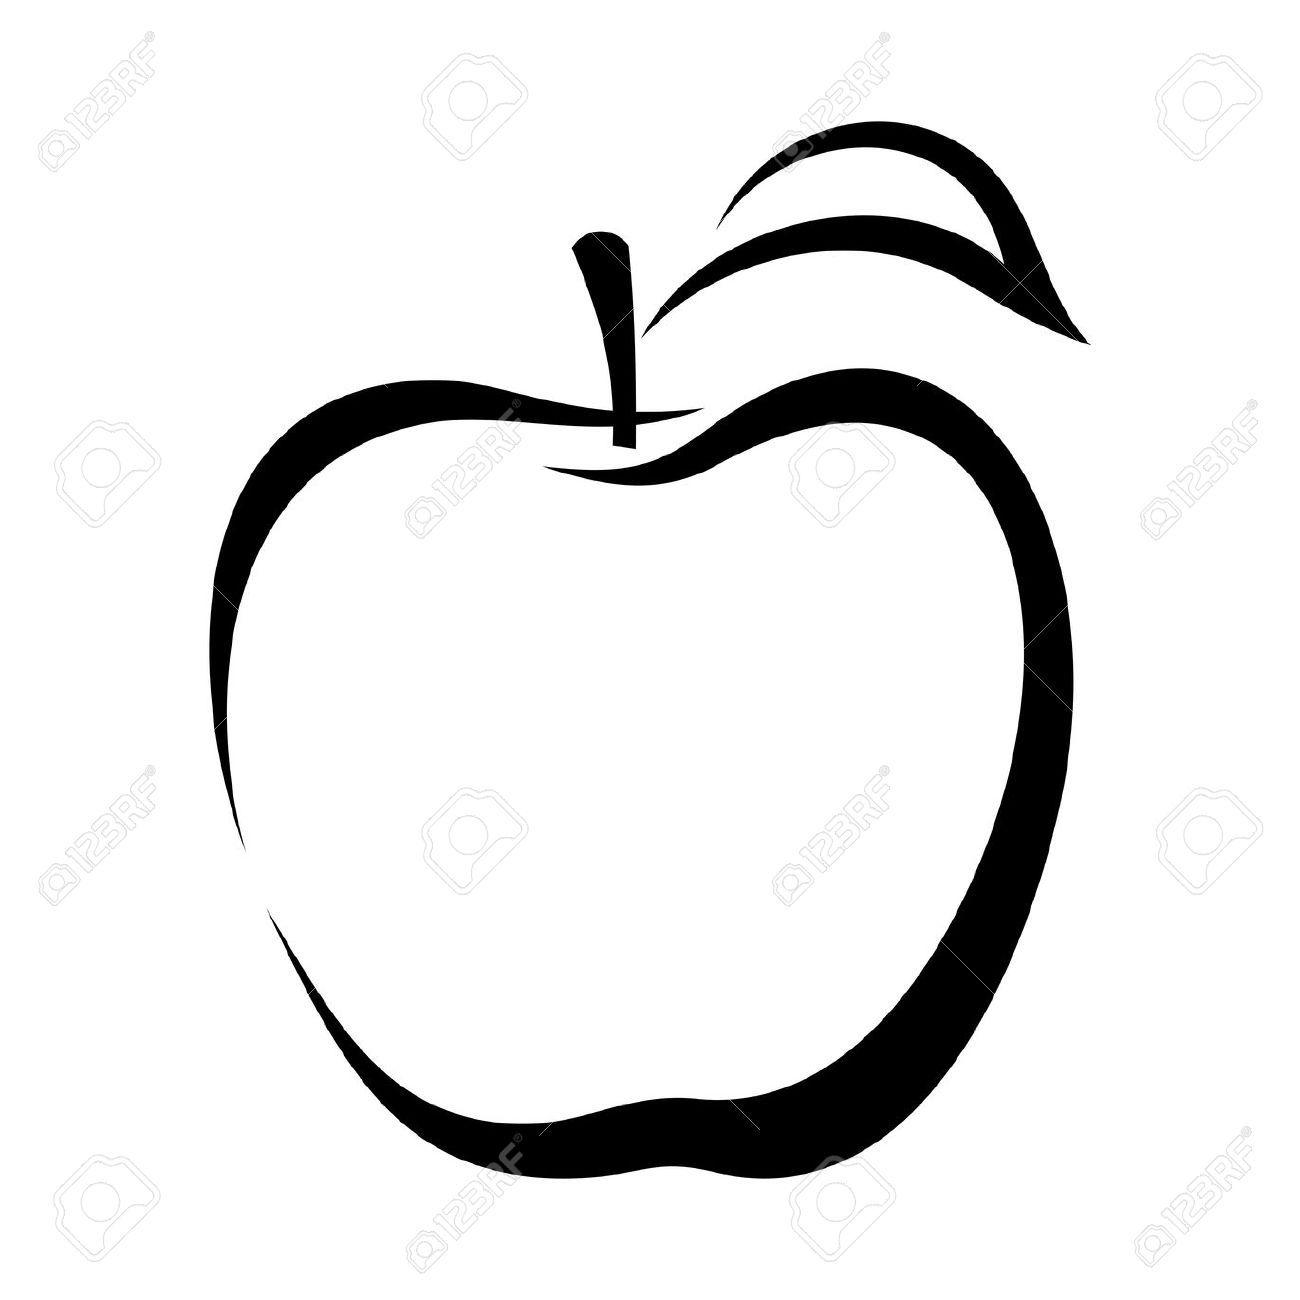 Vector Apple Google Search Apple Outline Apple Icon Apple Vector